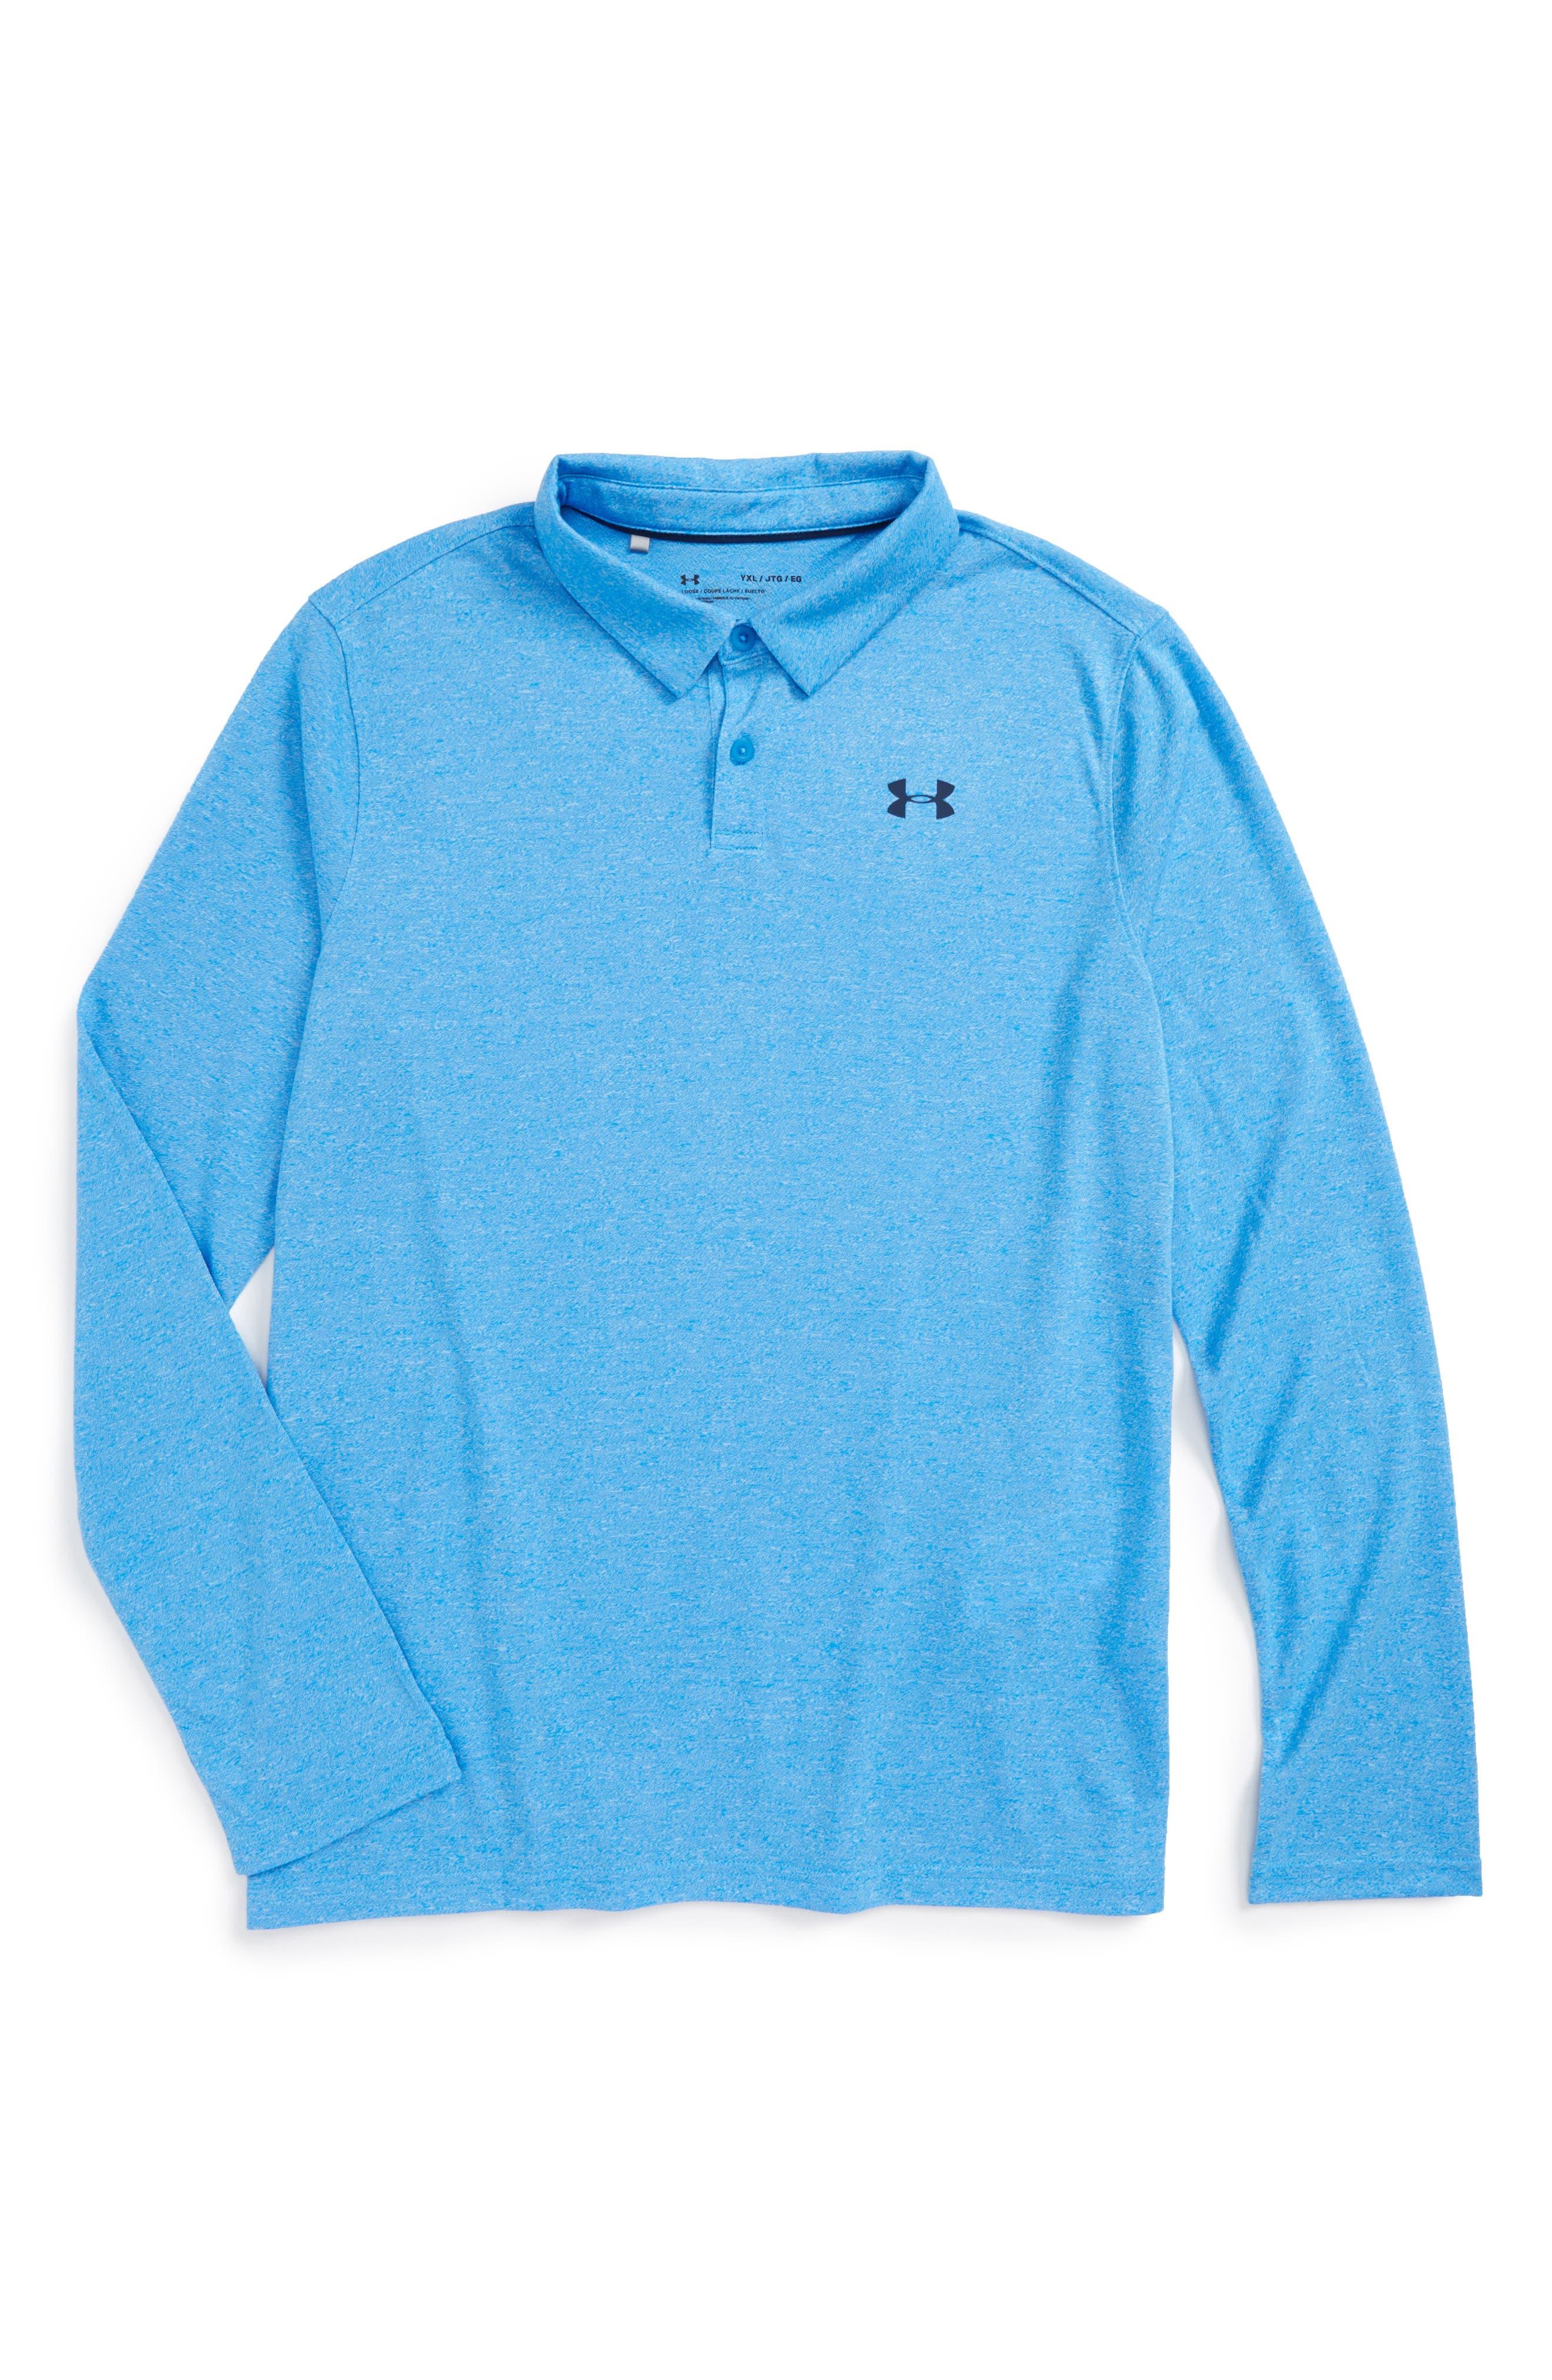 Threadborne<sup>™</sup> Long Sleeve Polo,                         Main,                         color, Mako Blue/ Academy